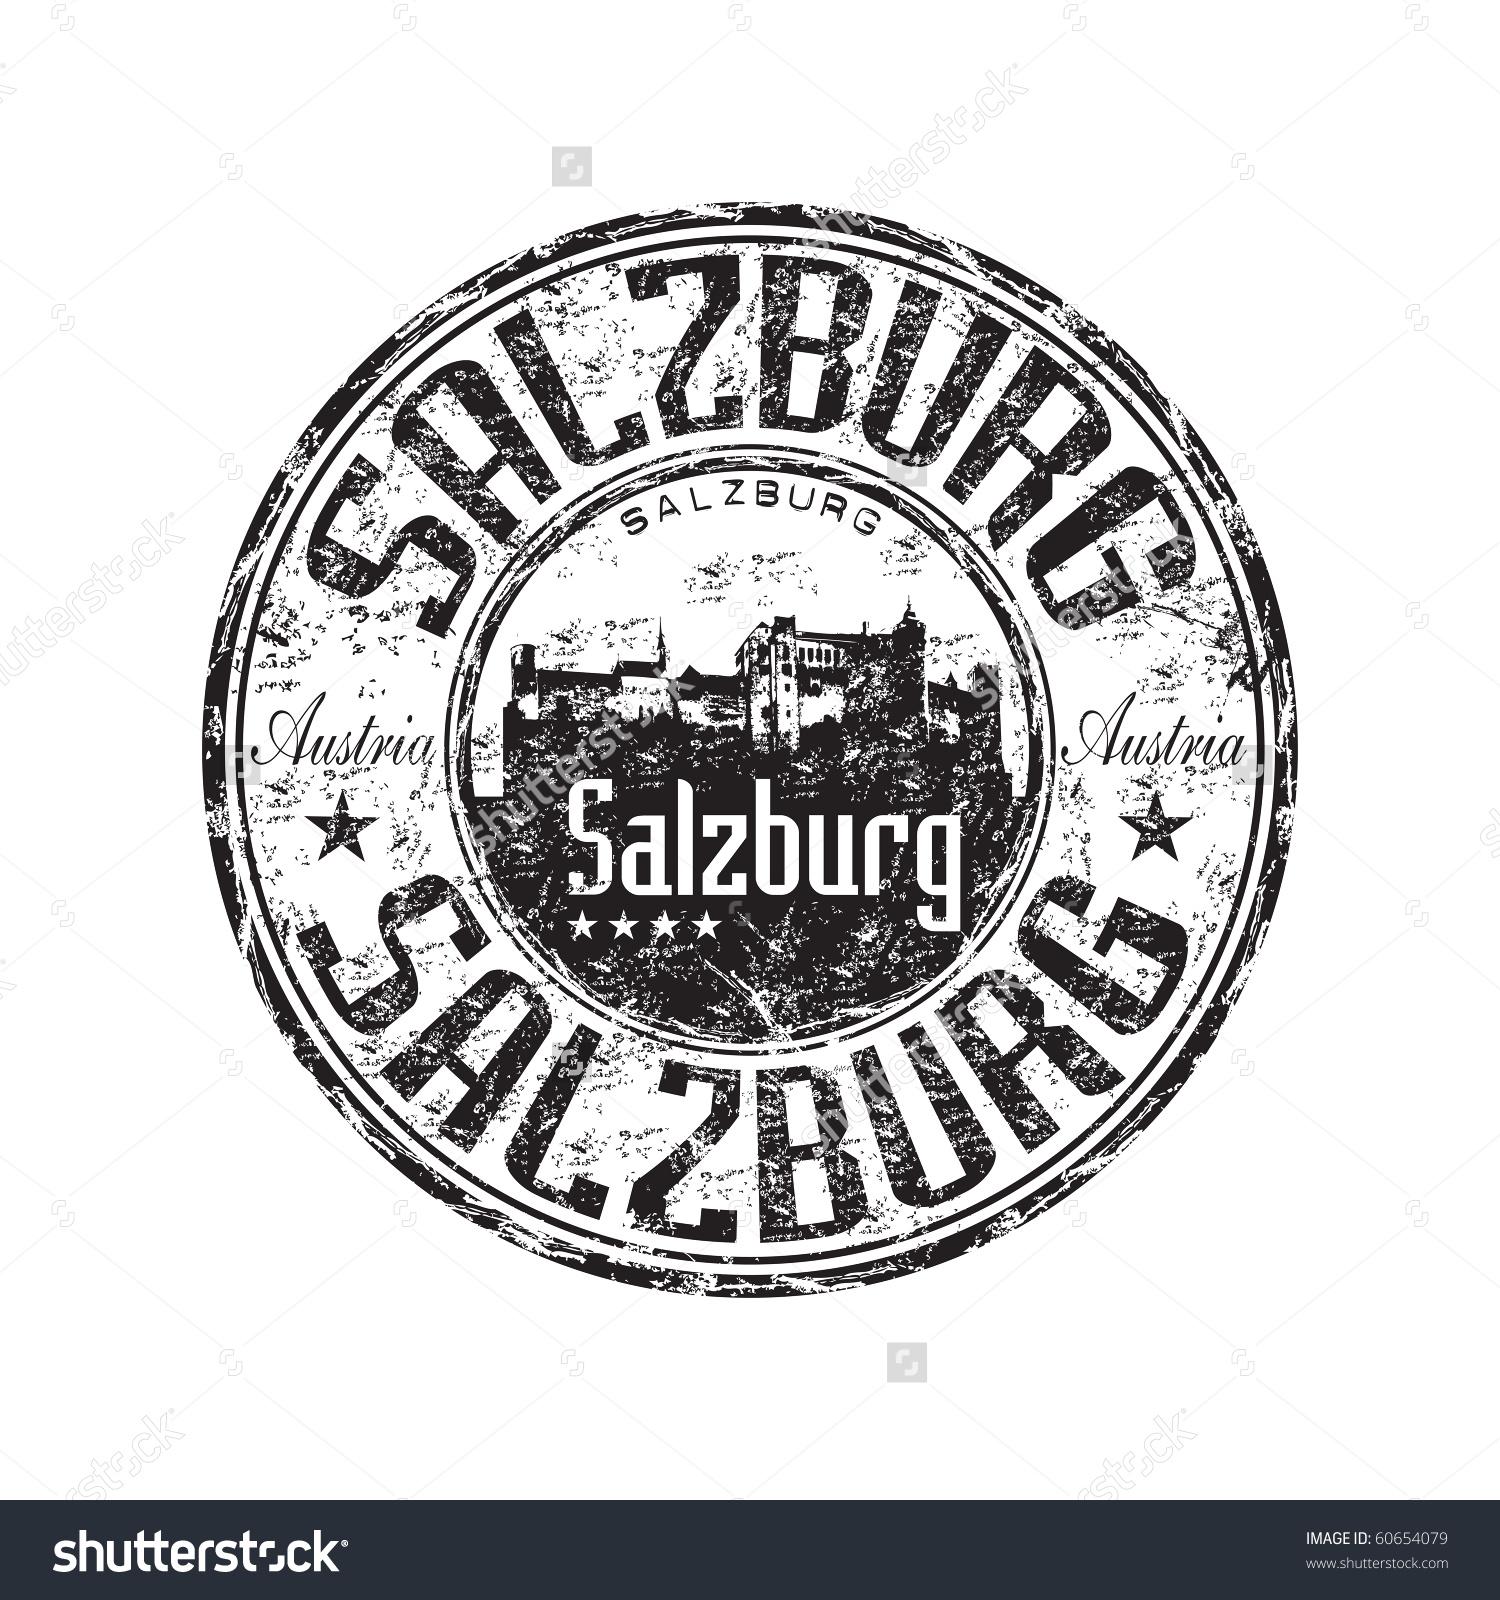 Black Grunge Rubber Stamp Castle Silhouette Stock Vector 60654079.